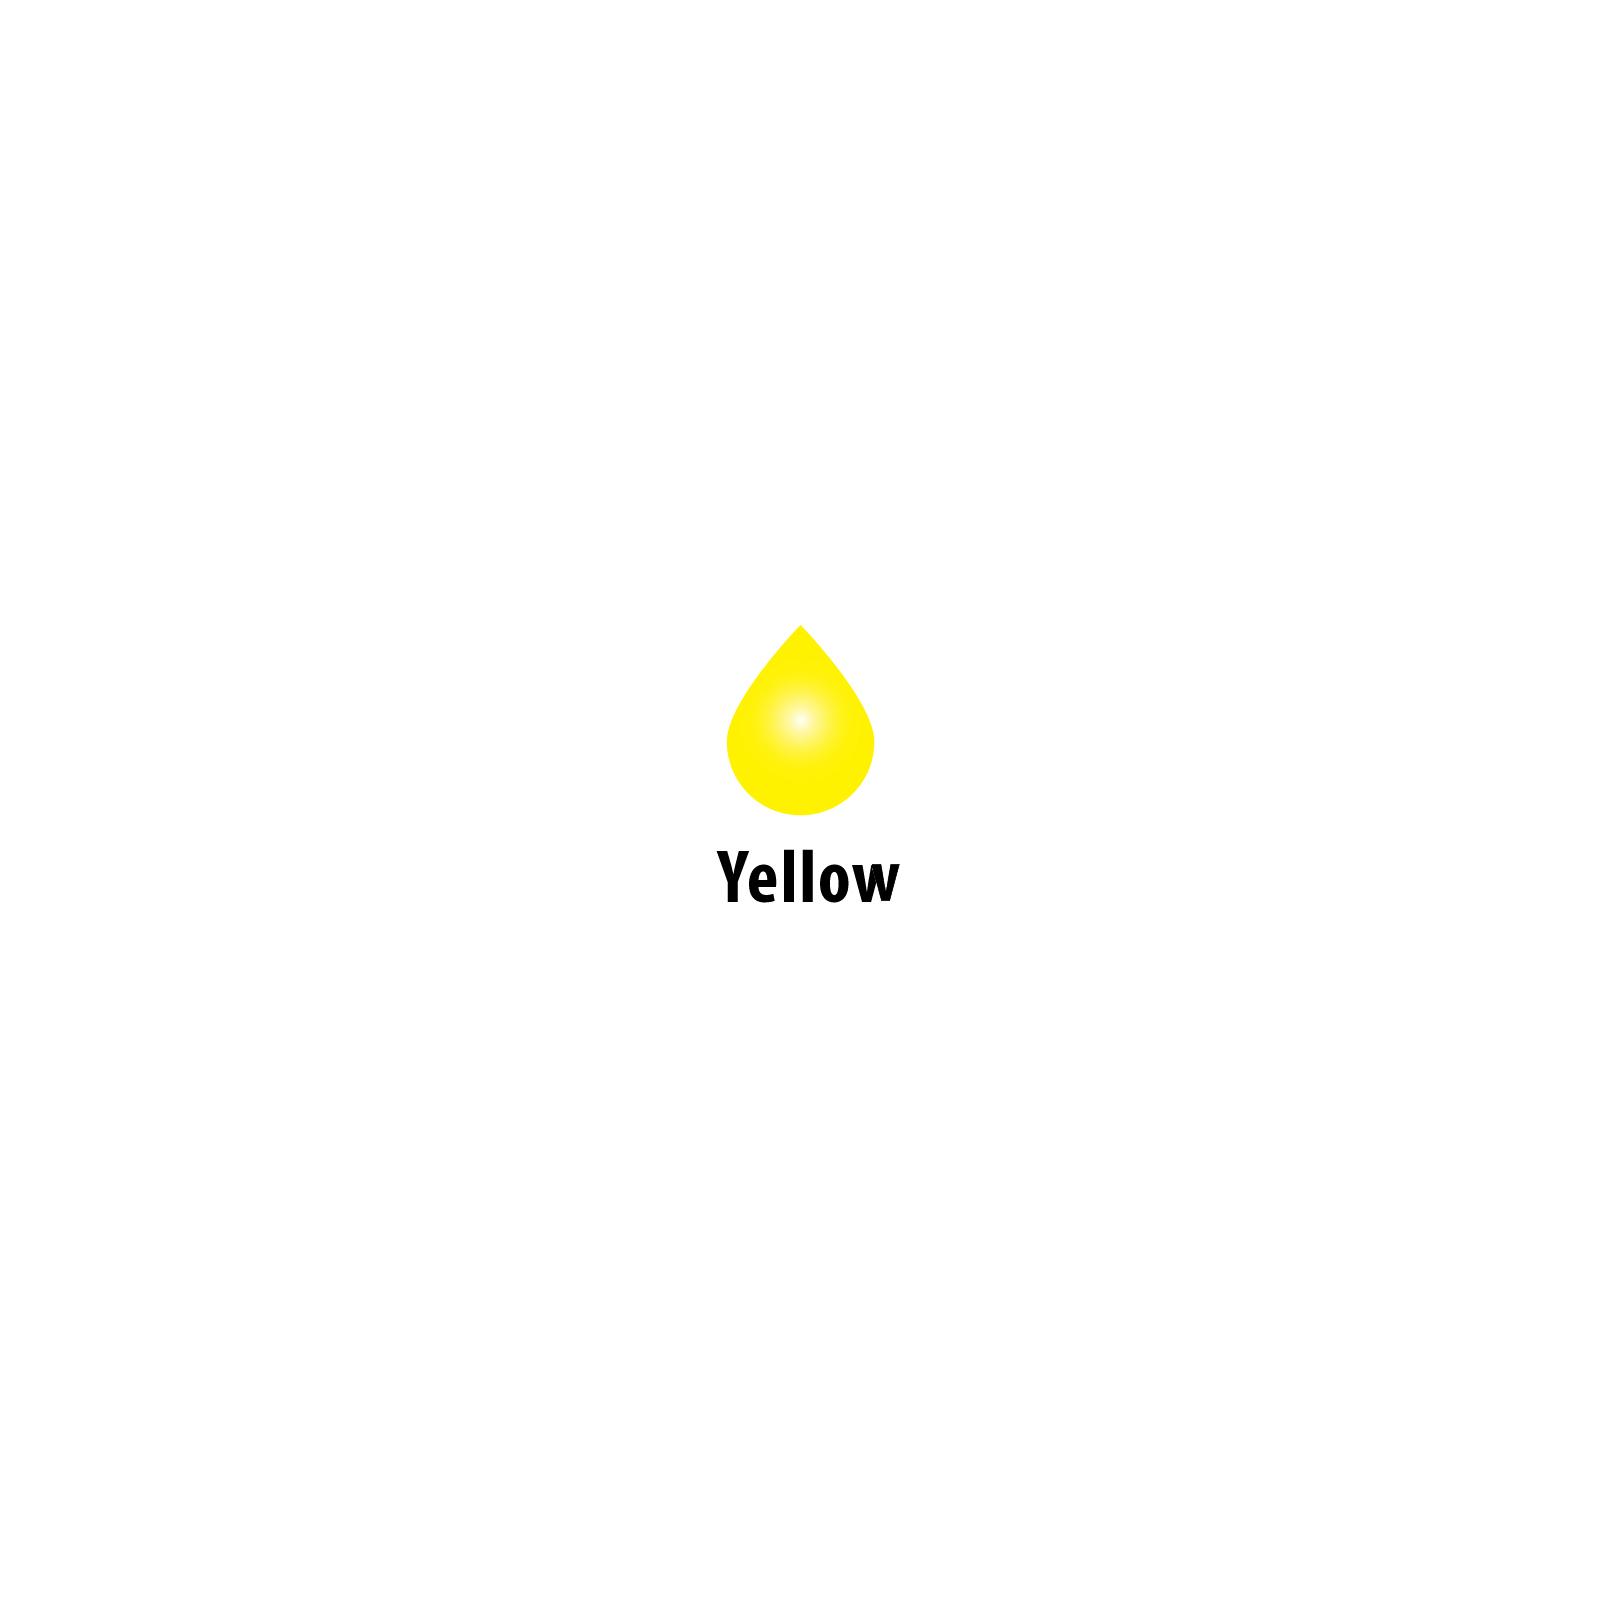 Чернила ColorWay Epson SC 67/87/79/91/T26 1л Yellow (CW-EW400Y1) изображение 2